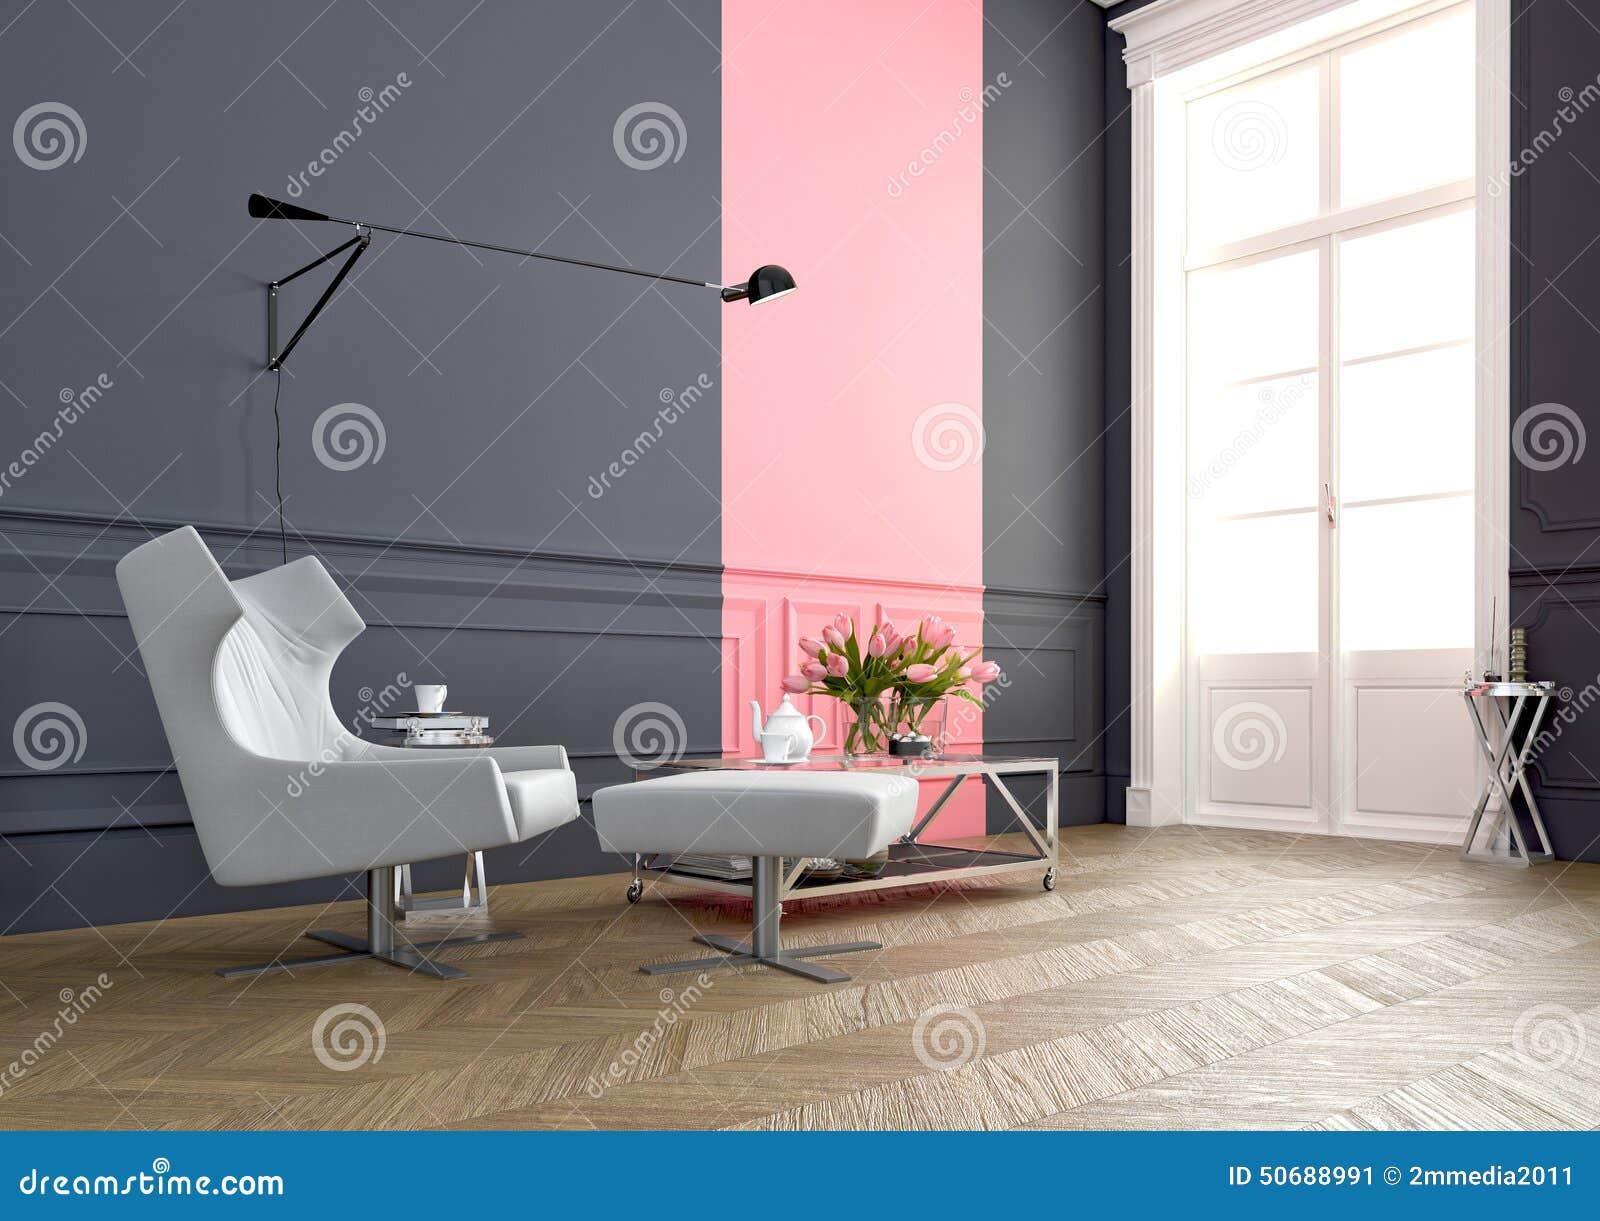 Download 胳膊椅子经典家具家内部样式 3d翻译 库存例证. 插画 包括有 办公室, 房子, 生活方式, 休闲, 放松 - 50688991